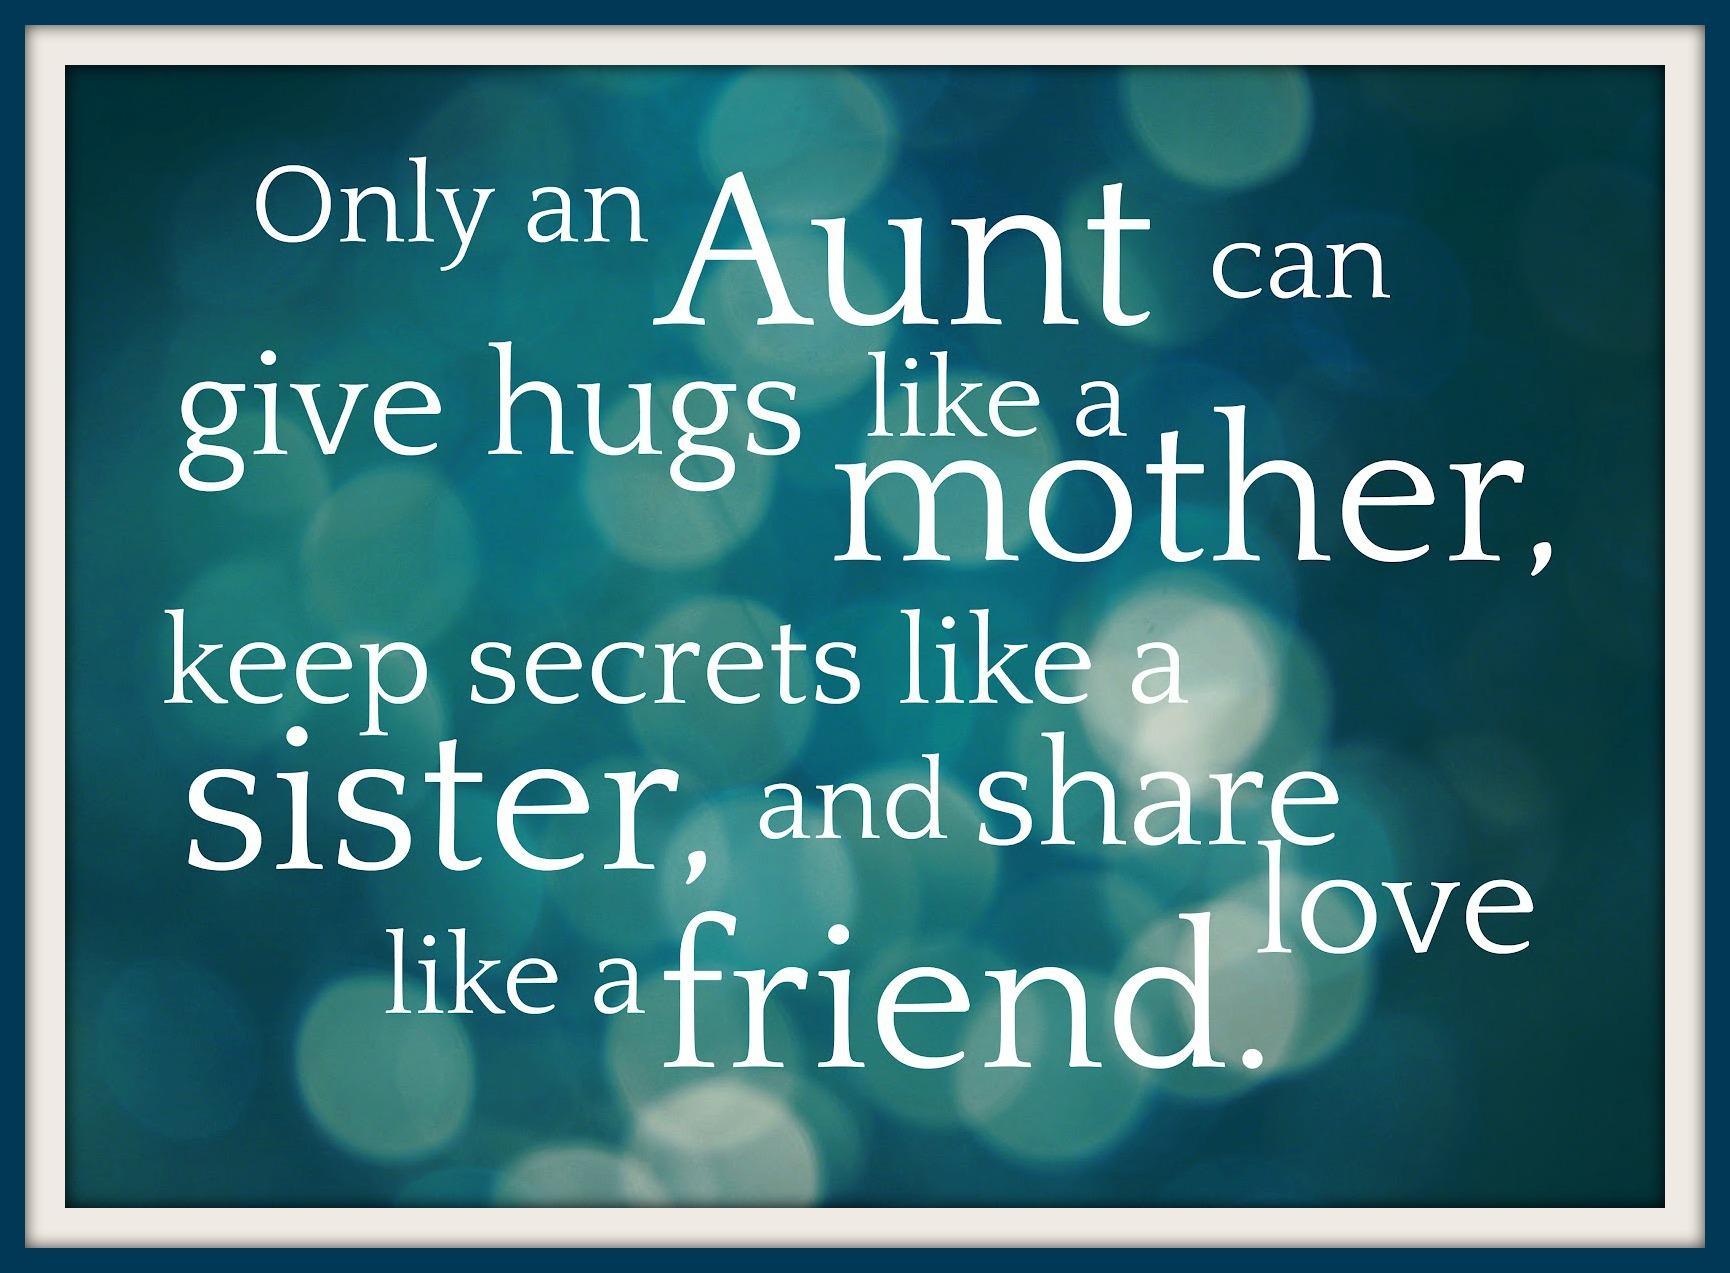 Aunt Quotes From Nephew: Happy Birthday Aunt Quotes. QuotesGram